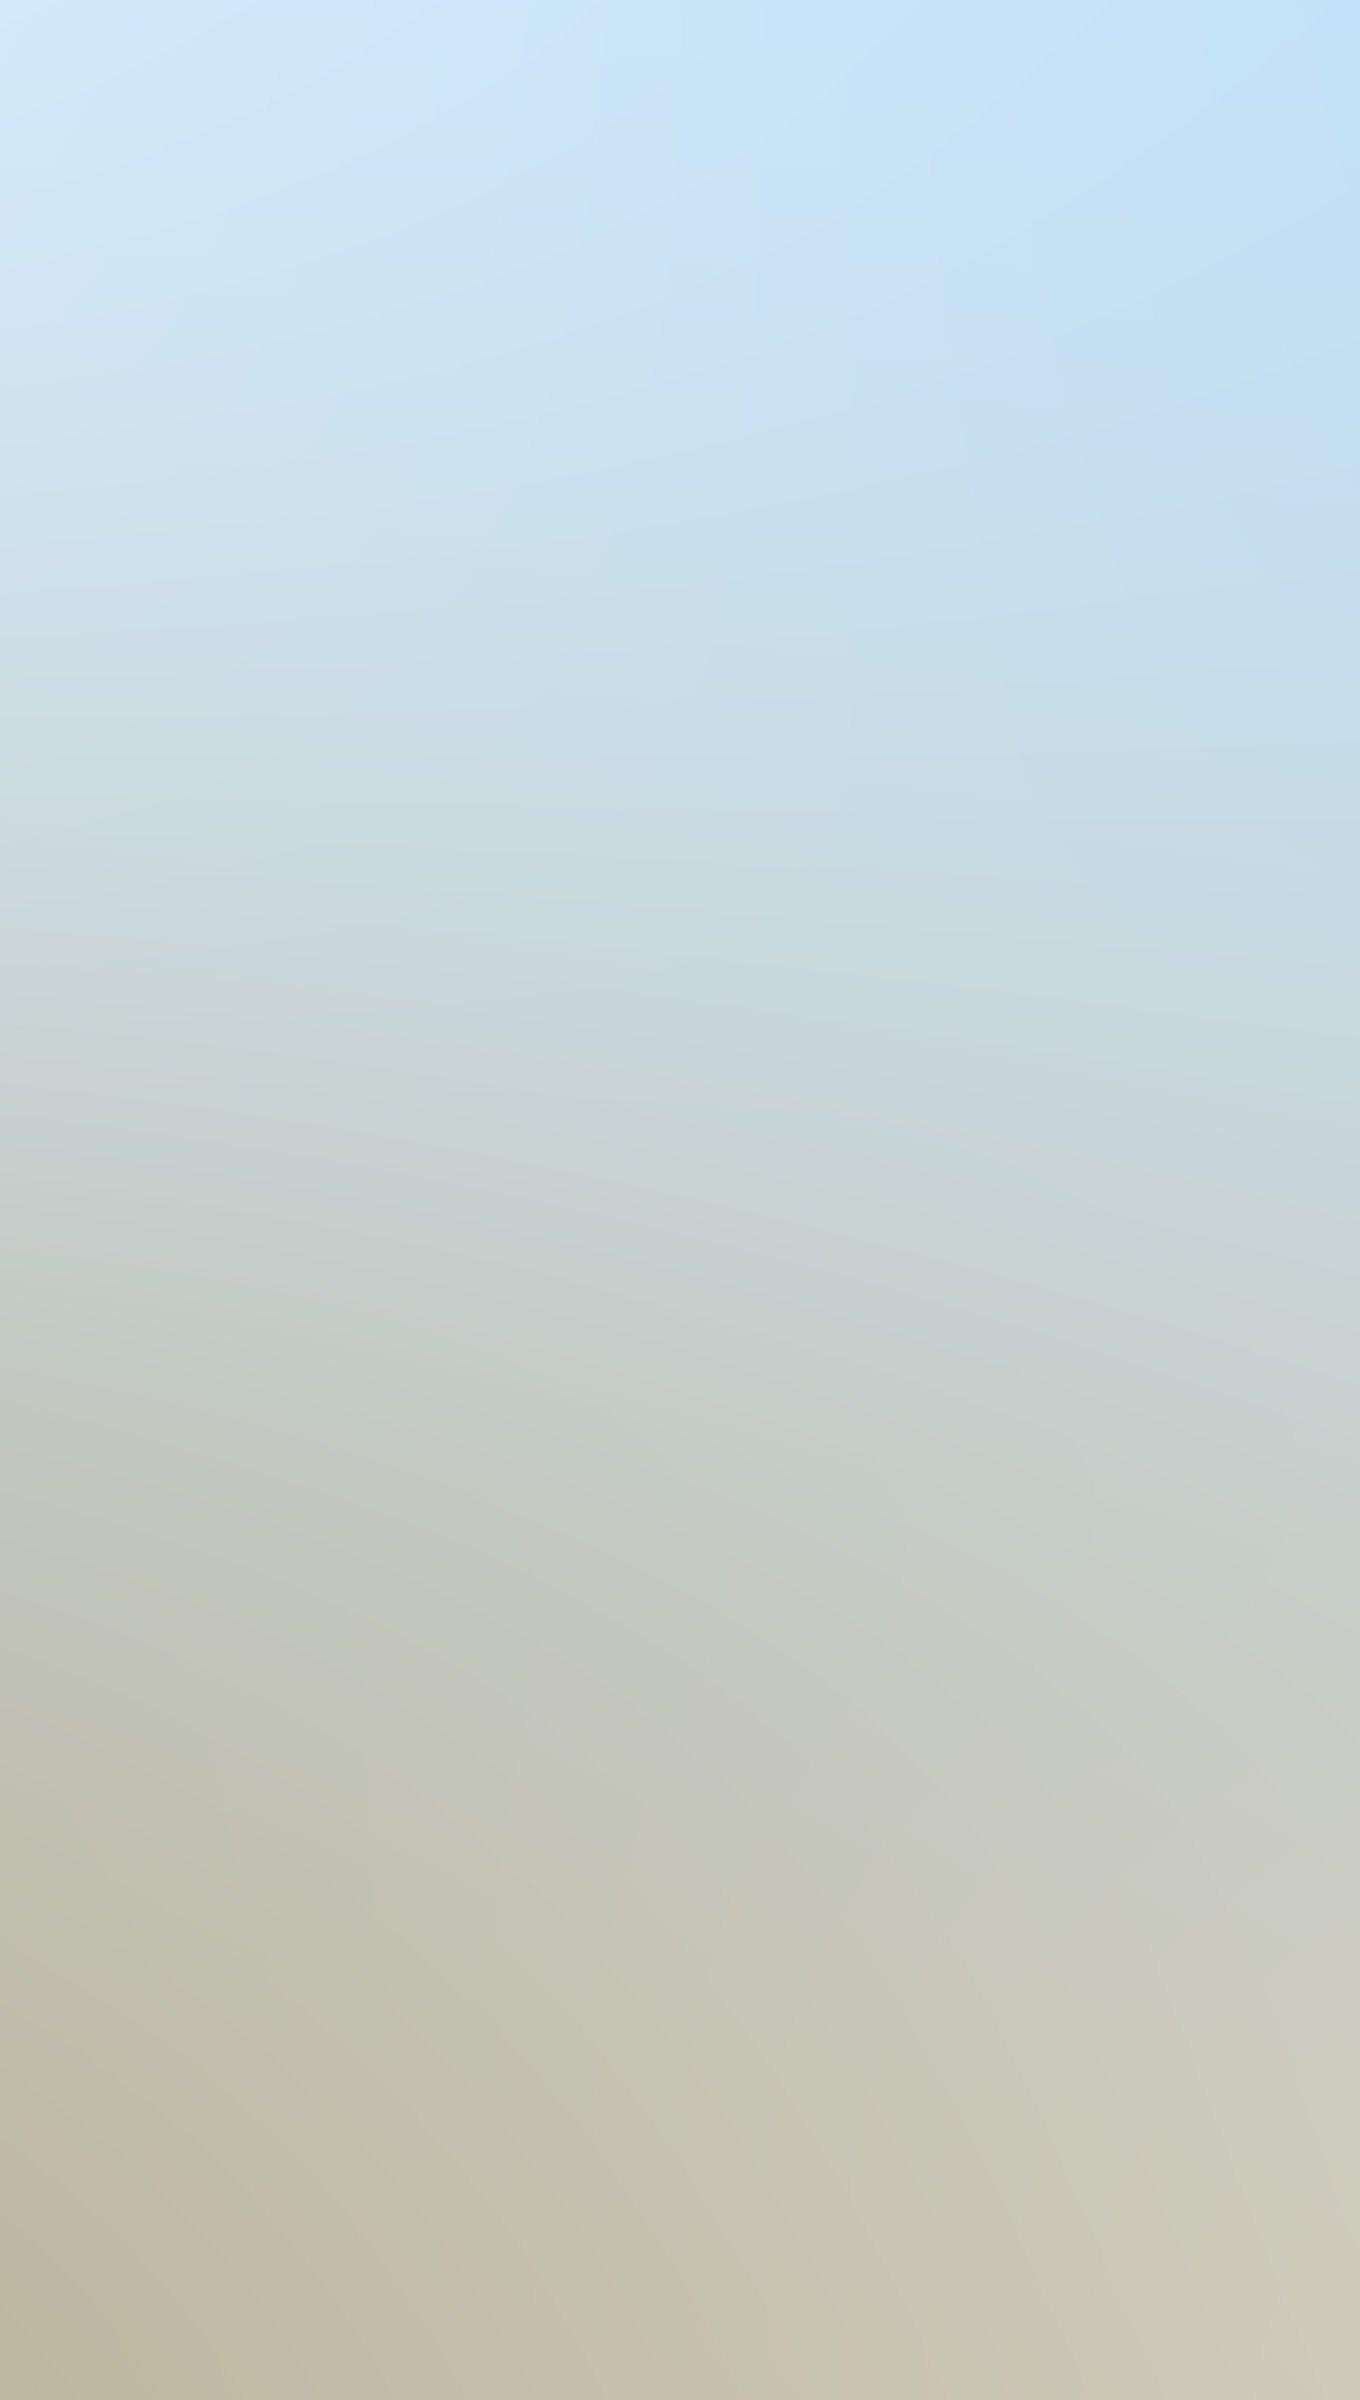 Wallpaper Blue and Brown blur gradient Vertical